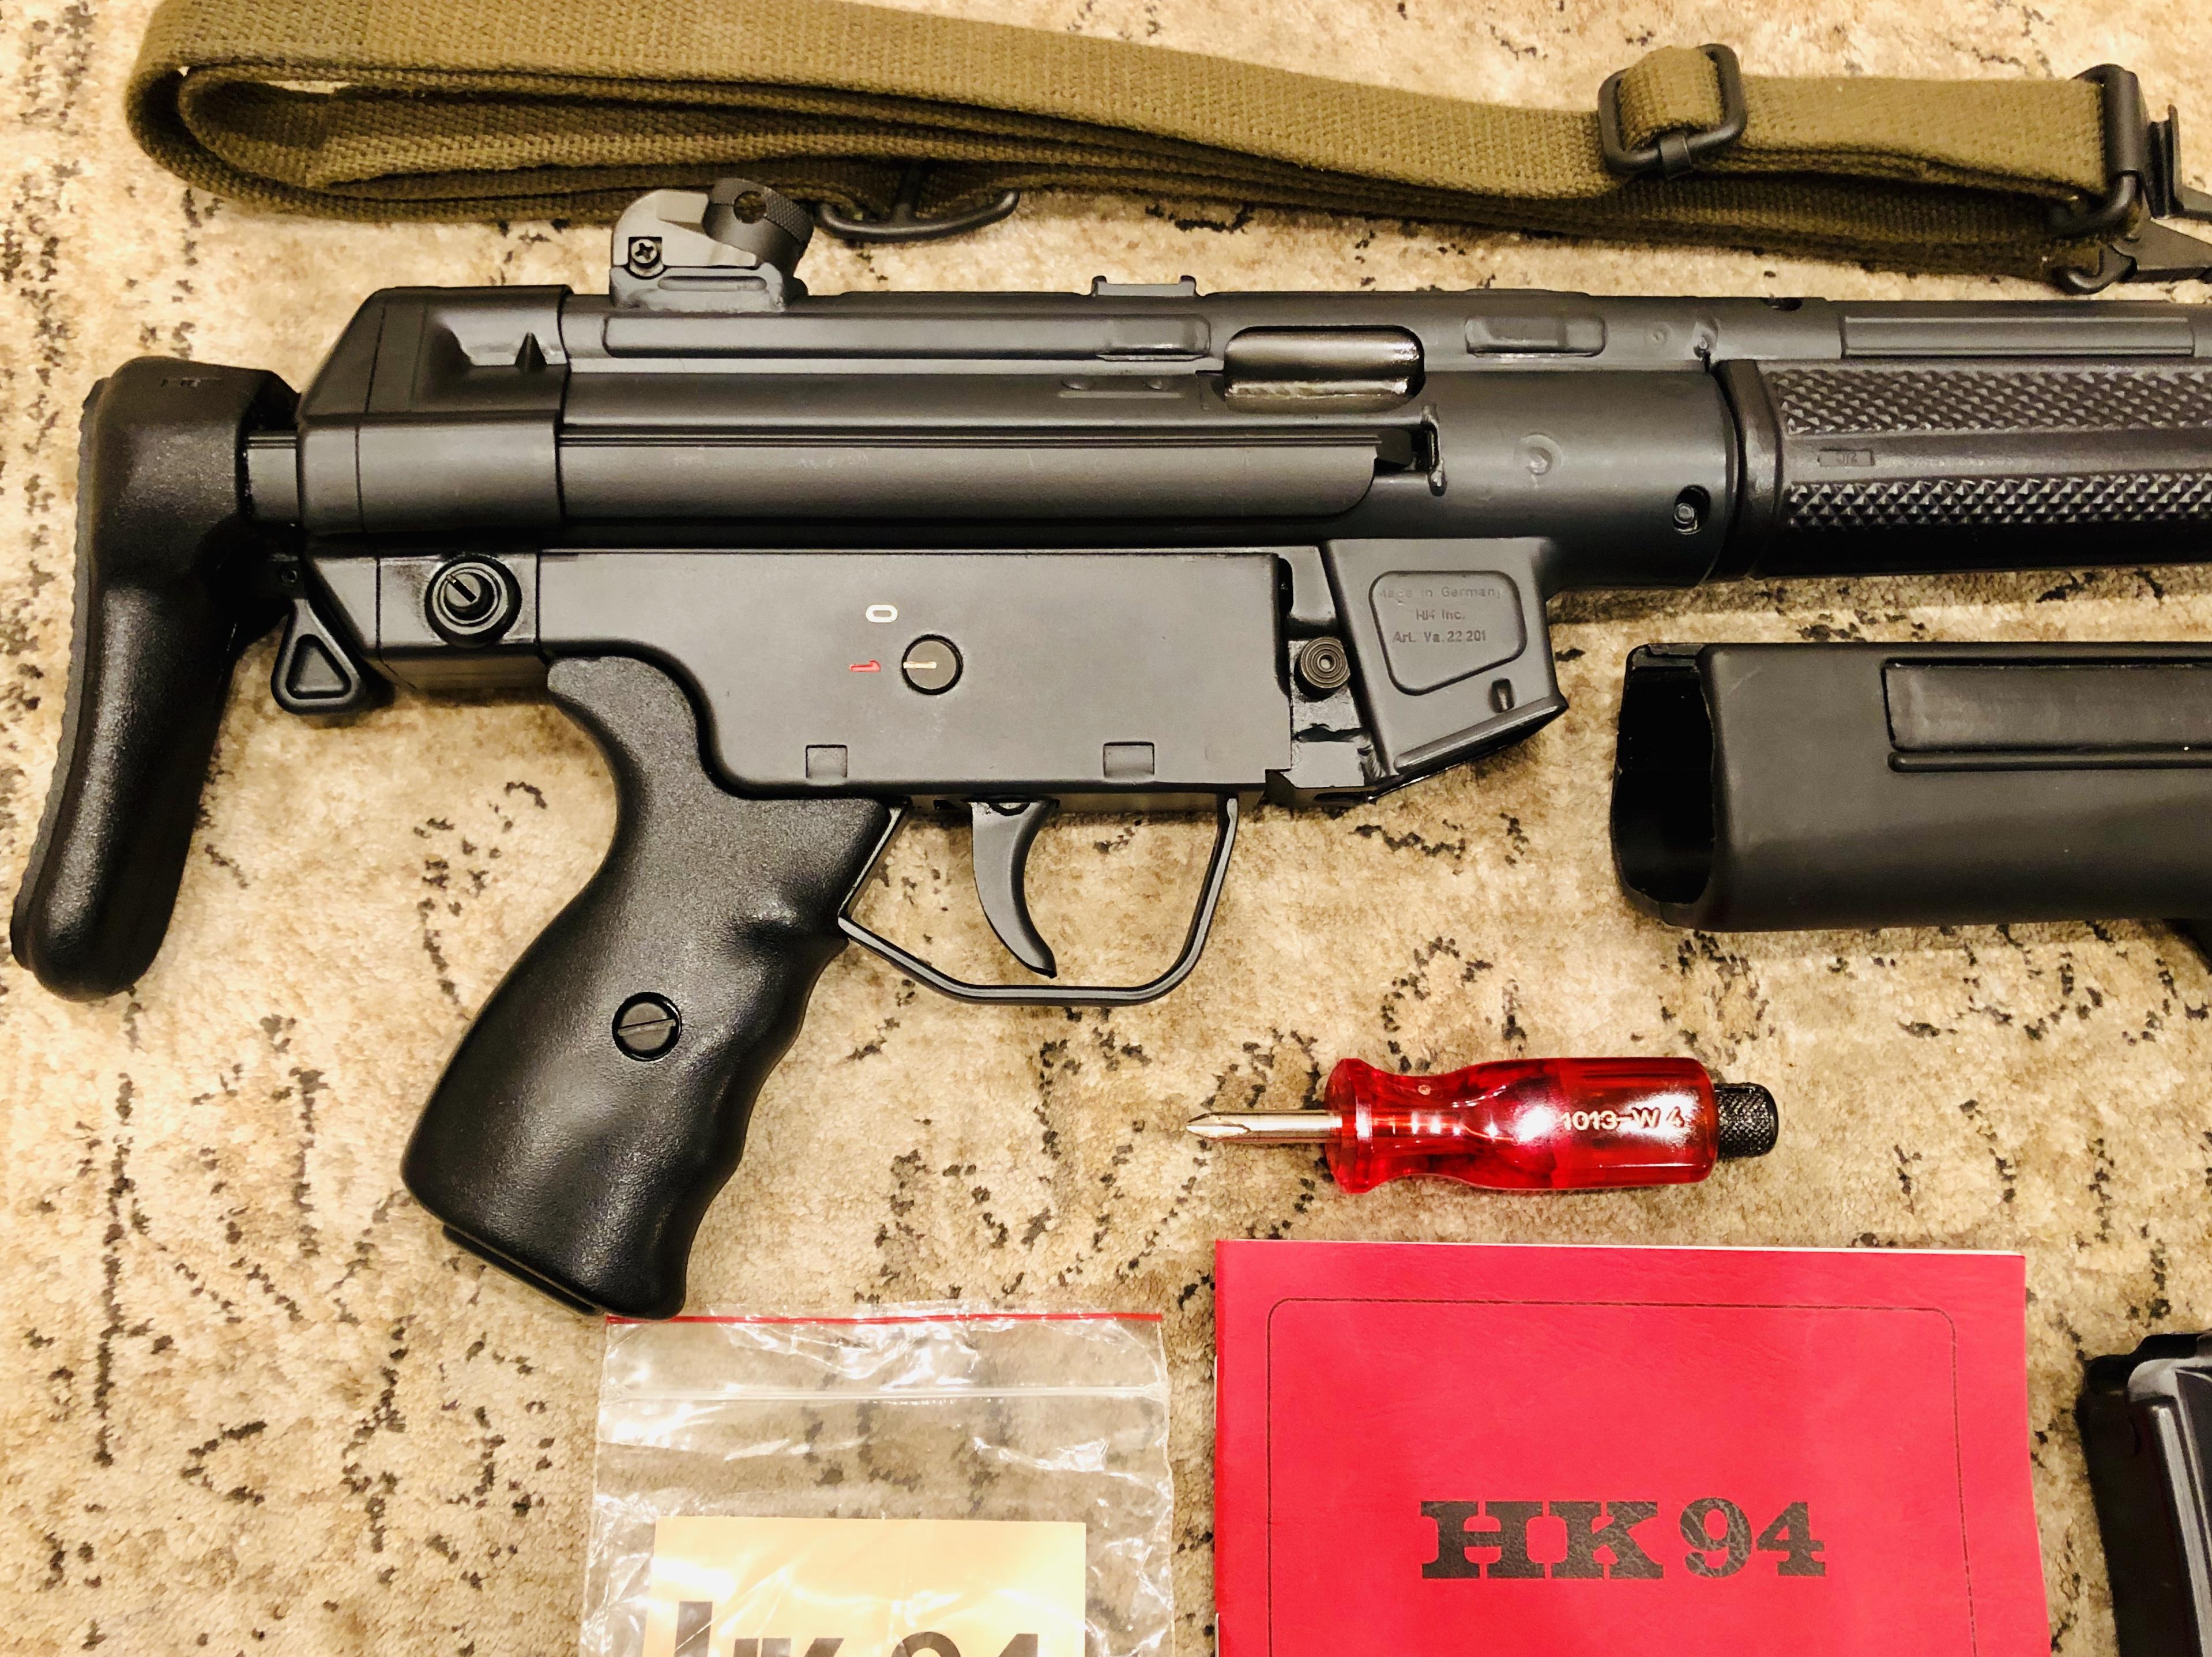 HK94 ID Code-13f6d195-91ba-4bb2-bcfd-376a5e156bc4.jpeg